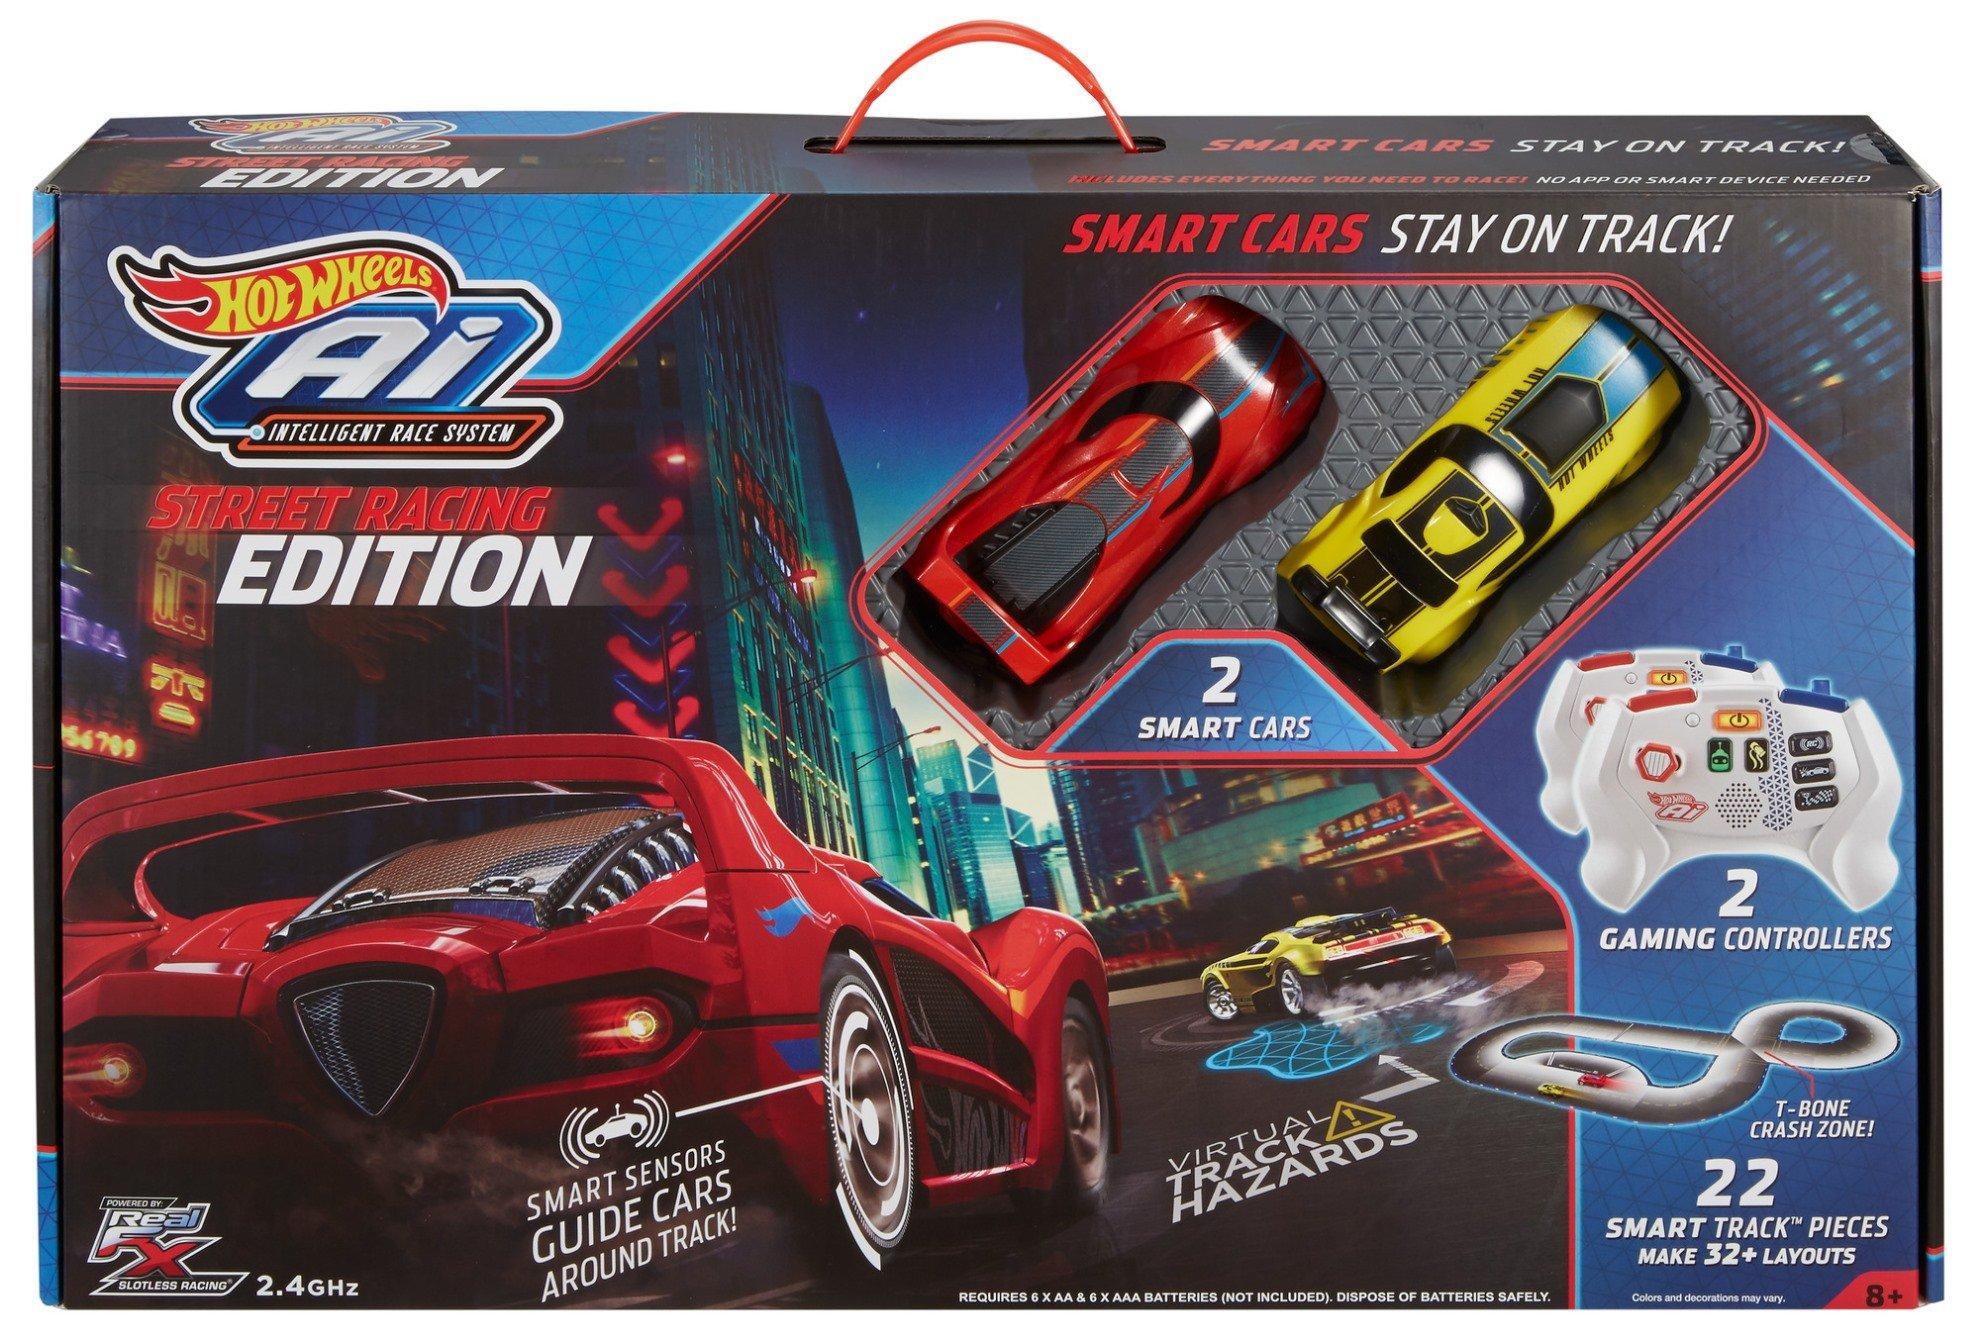 Hot Wheels Ai Starter Set Street Racing Edition by Hot Wheels (Image #1)